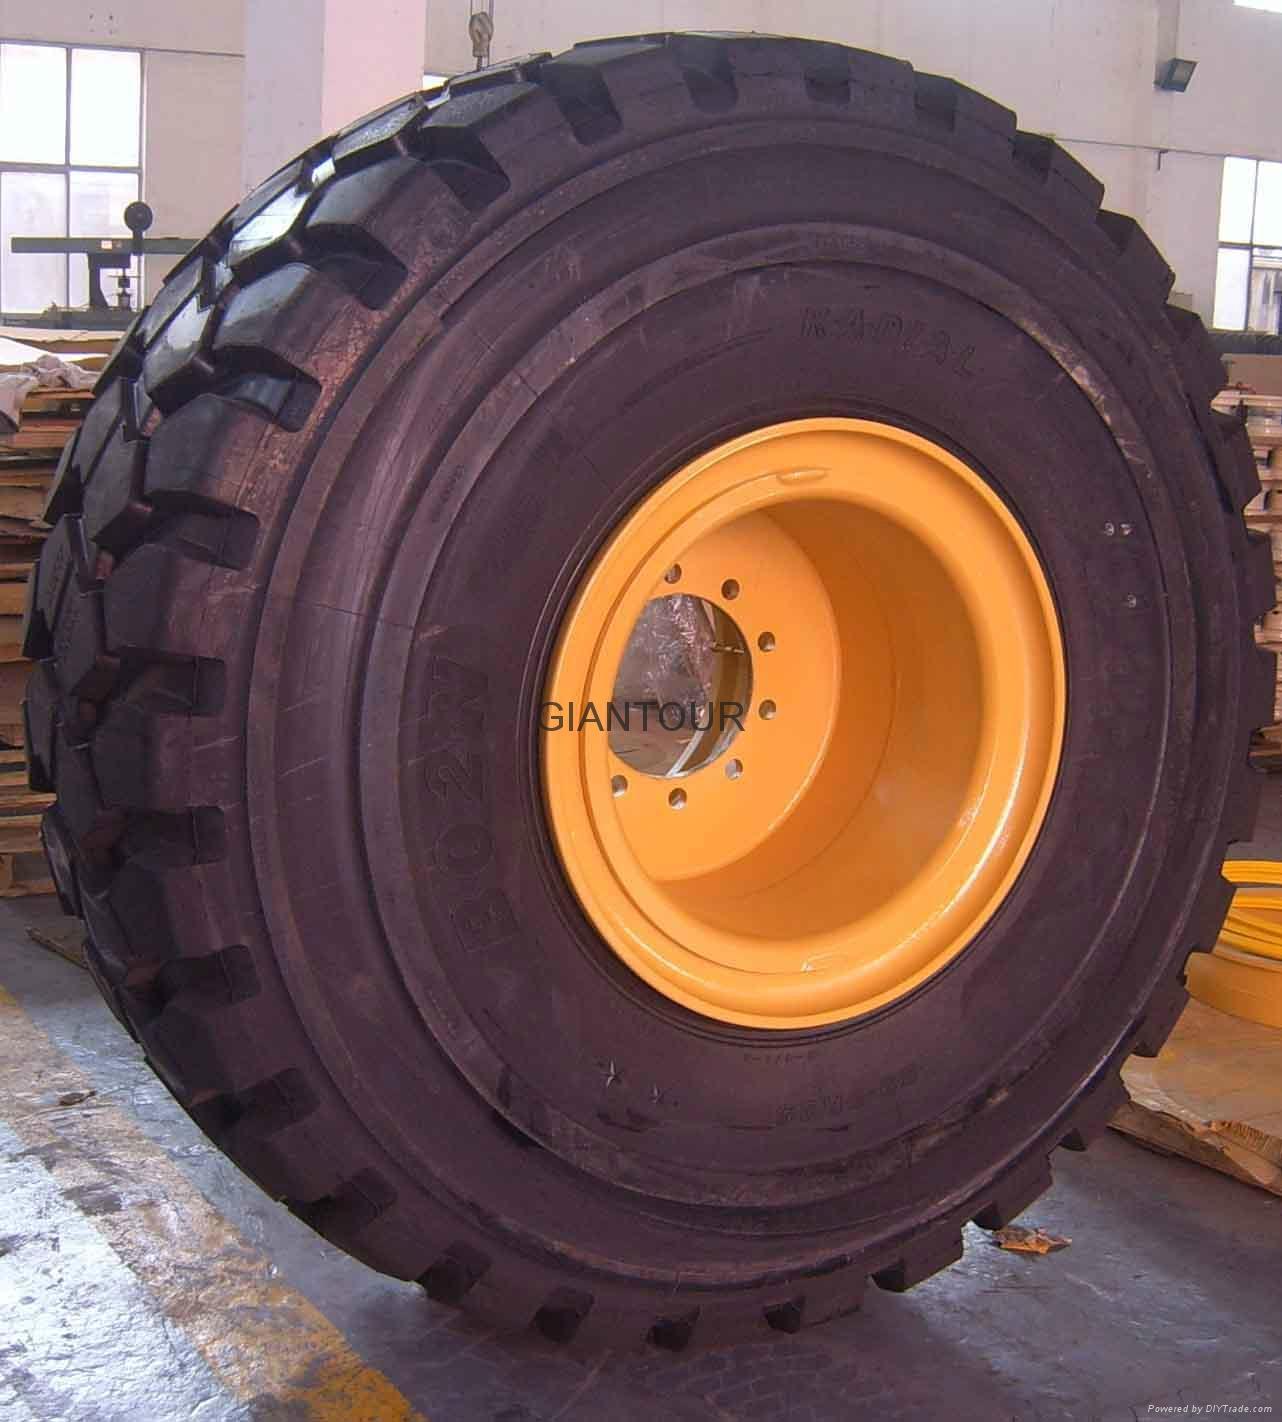 Sell earthmoving rim wheel OTR rig tire rim  25x25.00/3.5 for Rig power trailer